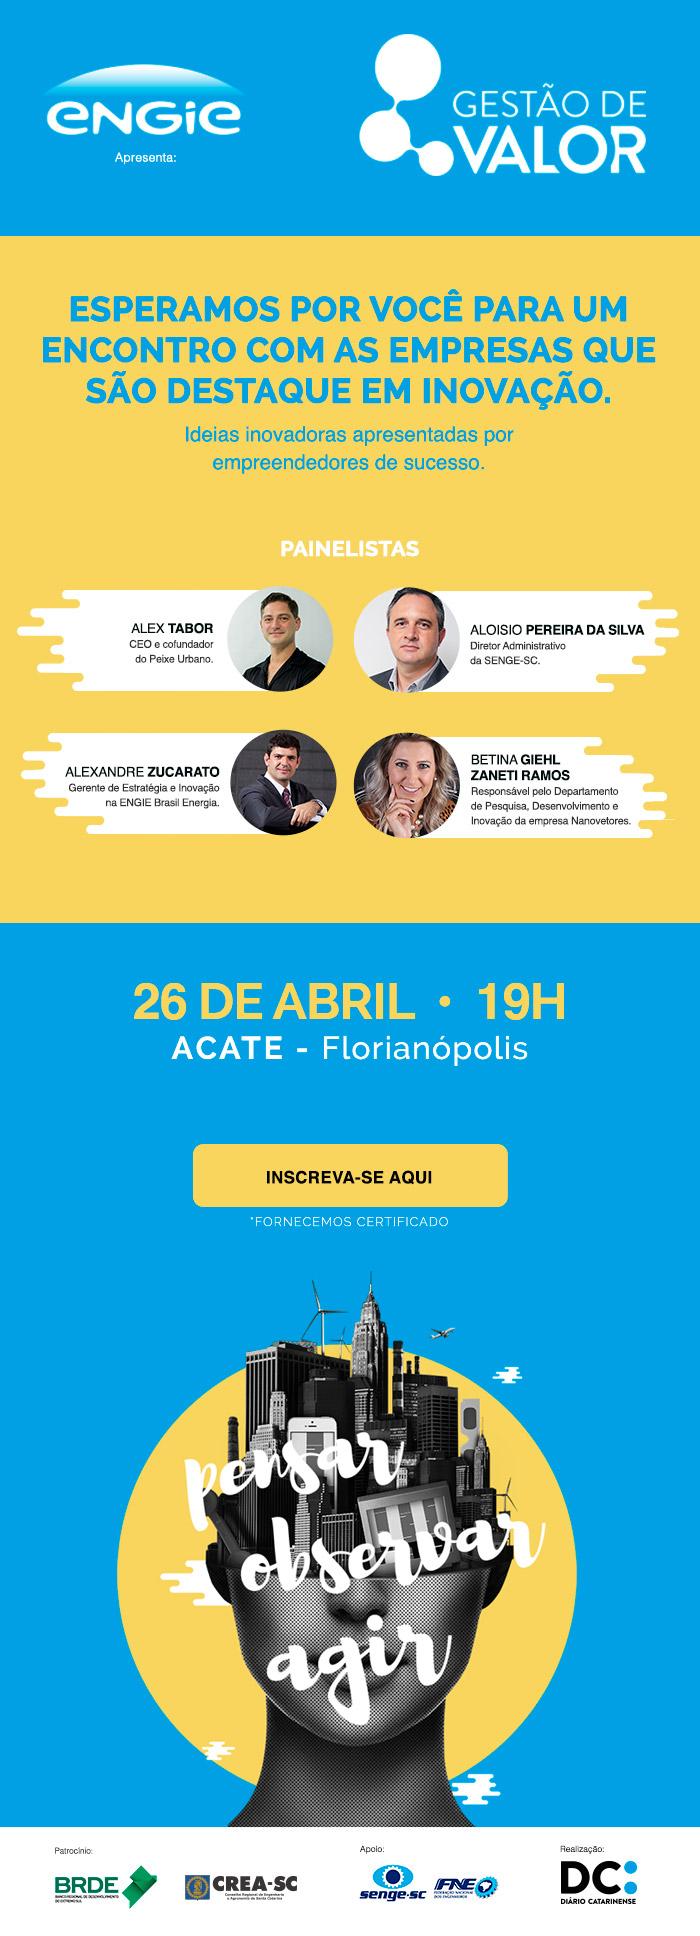 emkt_convite_painelistas_floripa